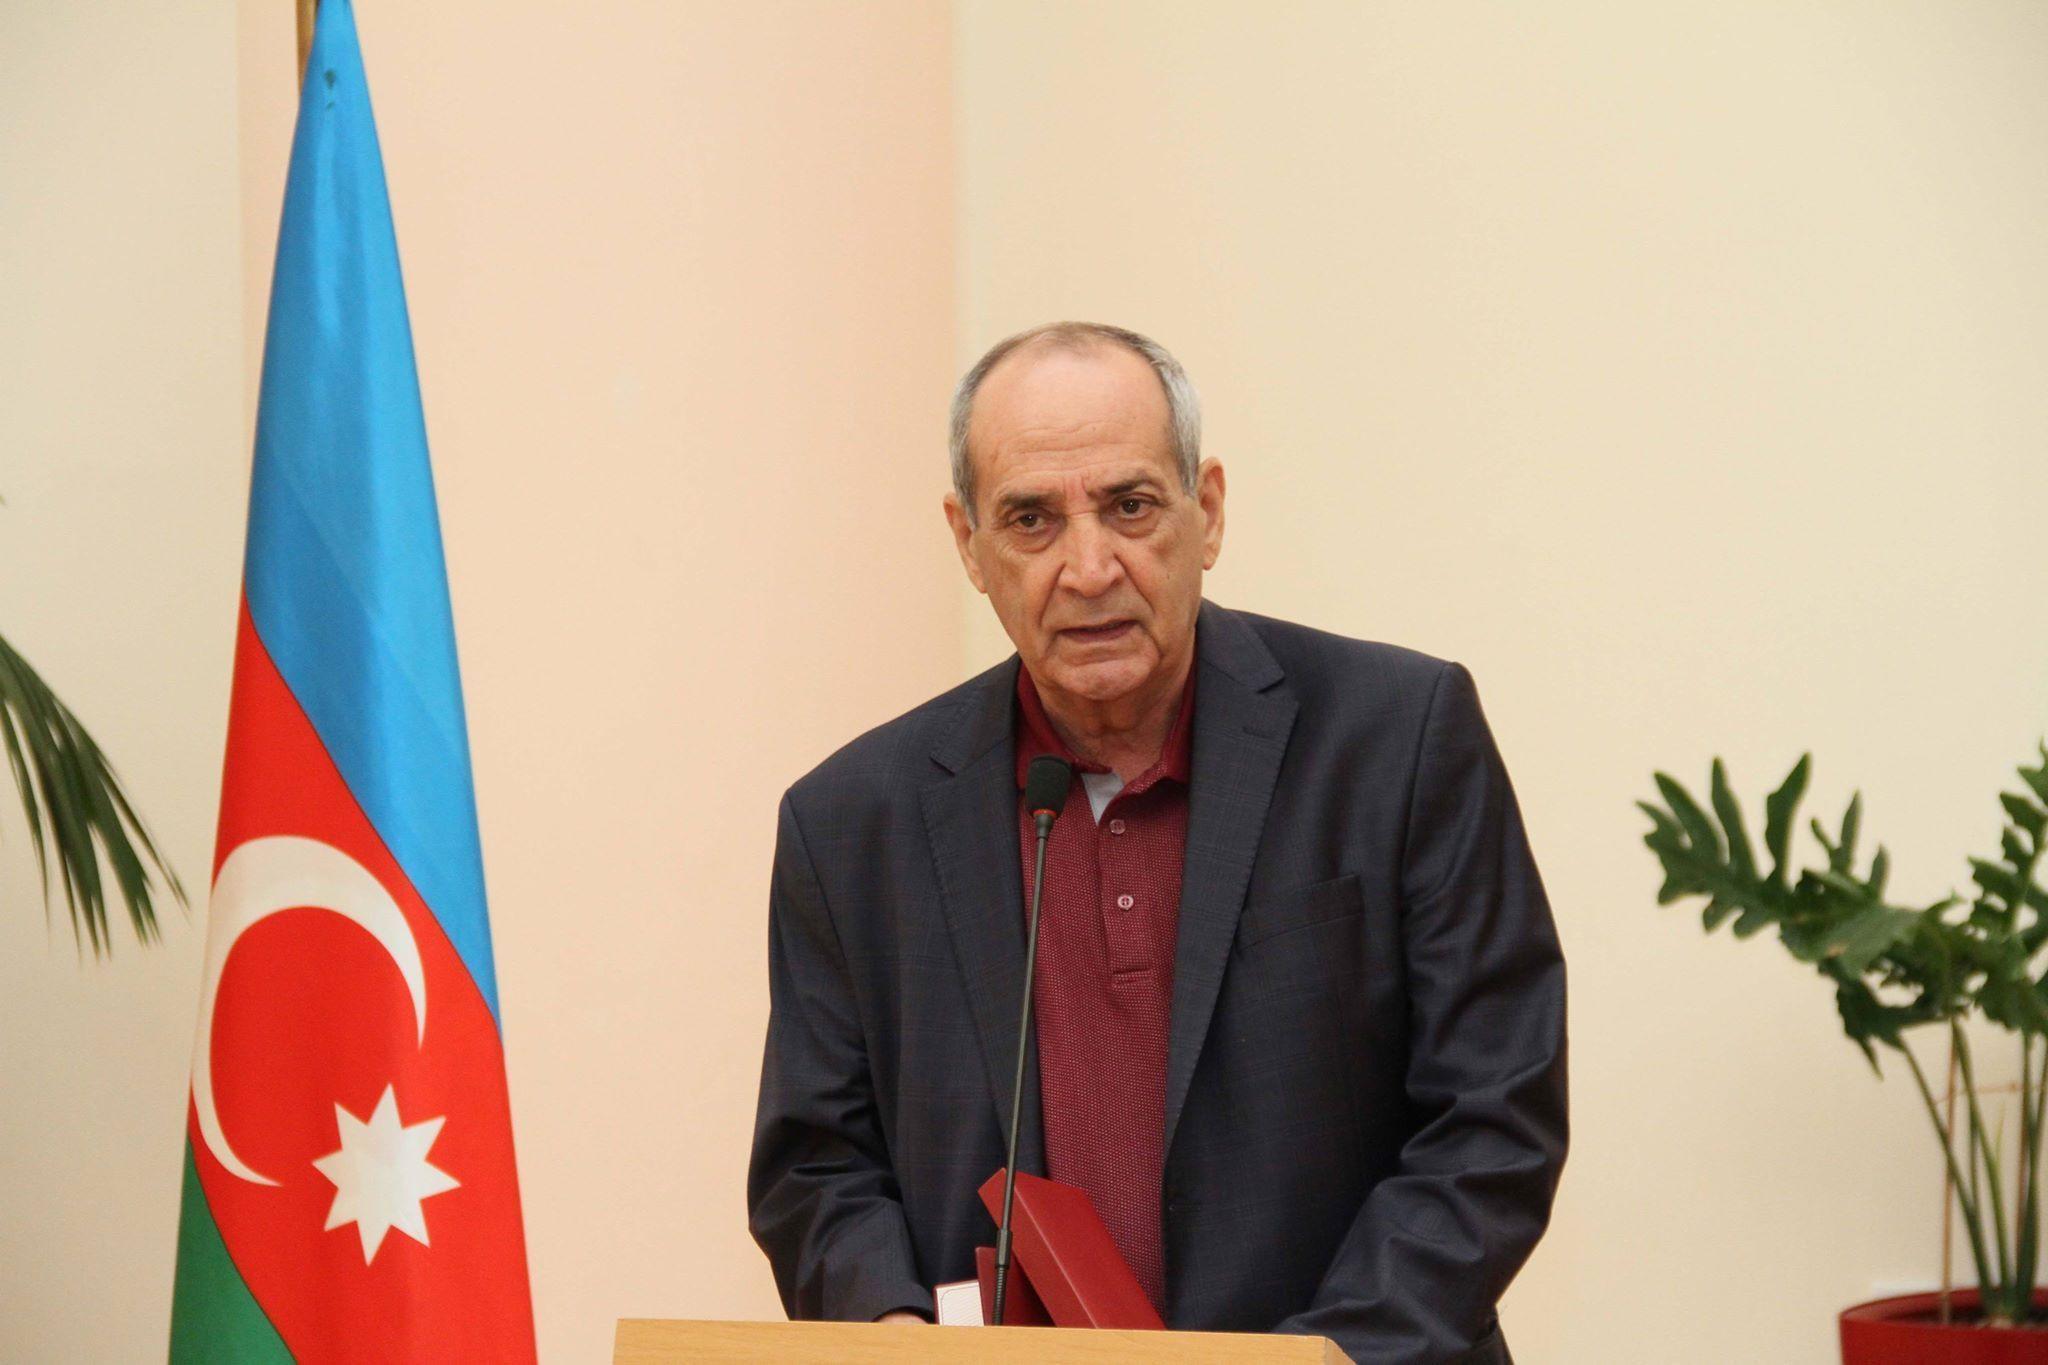 Президент Ильхам Алиев позвонил народному артисту Расиму Балаеву